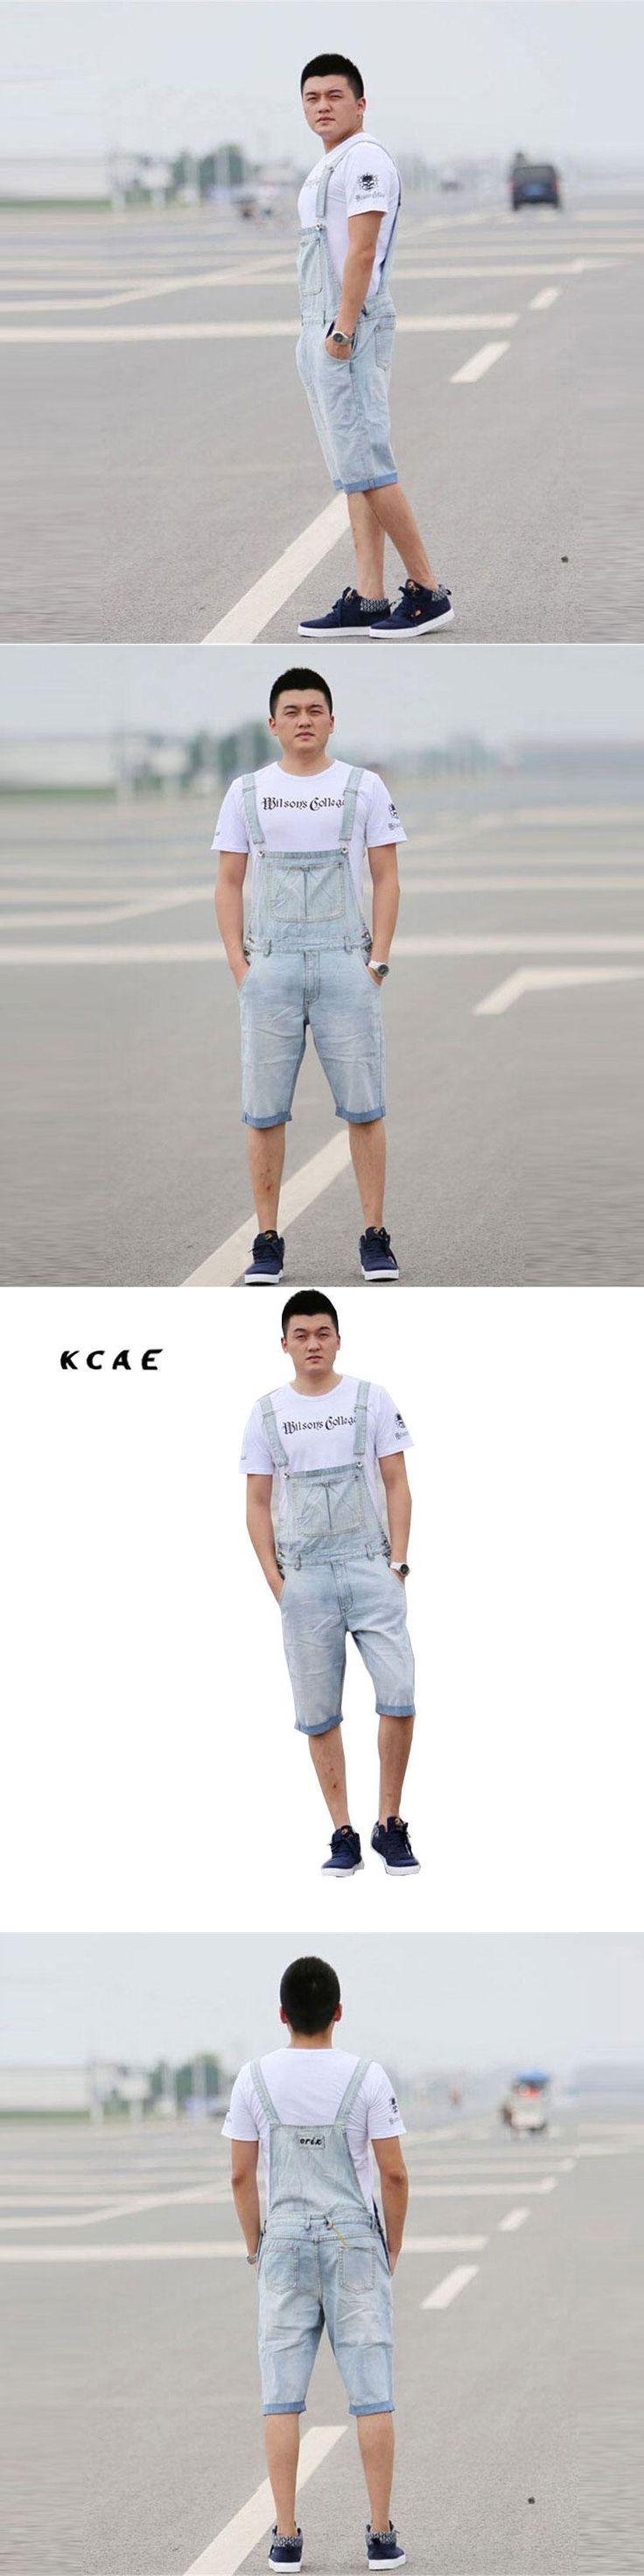 Denim Bib Overalls Shorts Men Summer Fashion Men's Jeans Jumpsuits Rompers Plus Size S M L XL 2XL 3XL 4XL 5XL